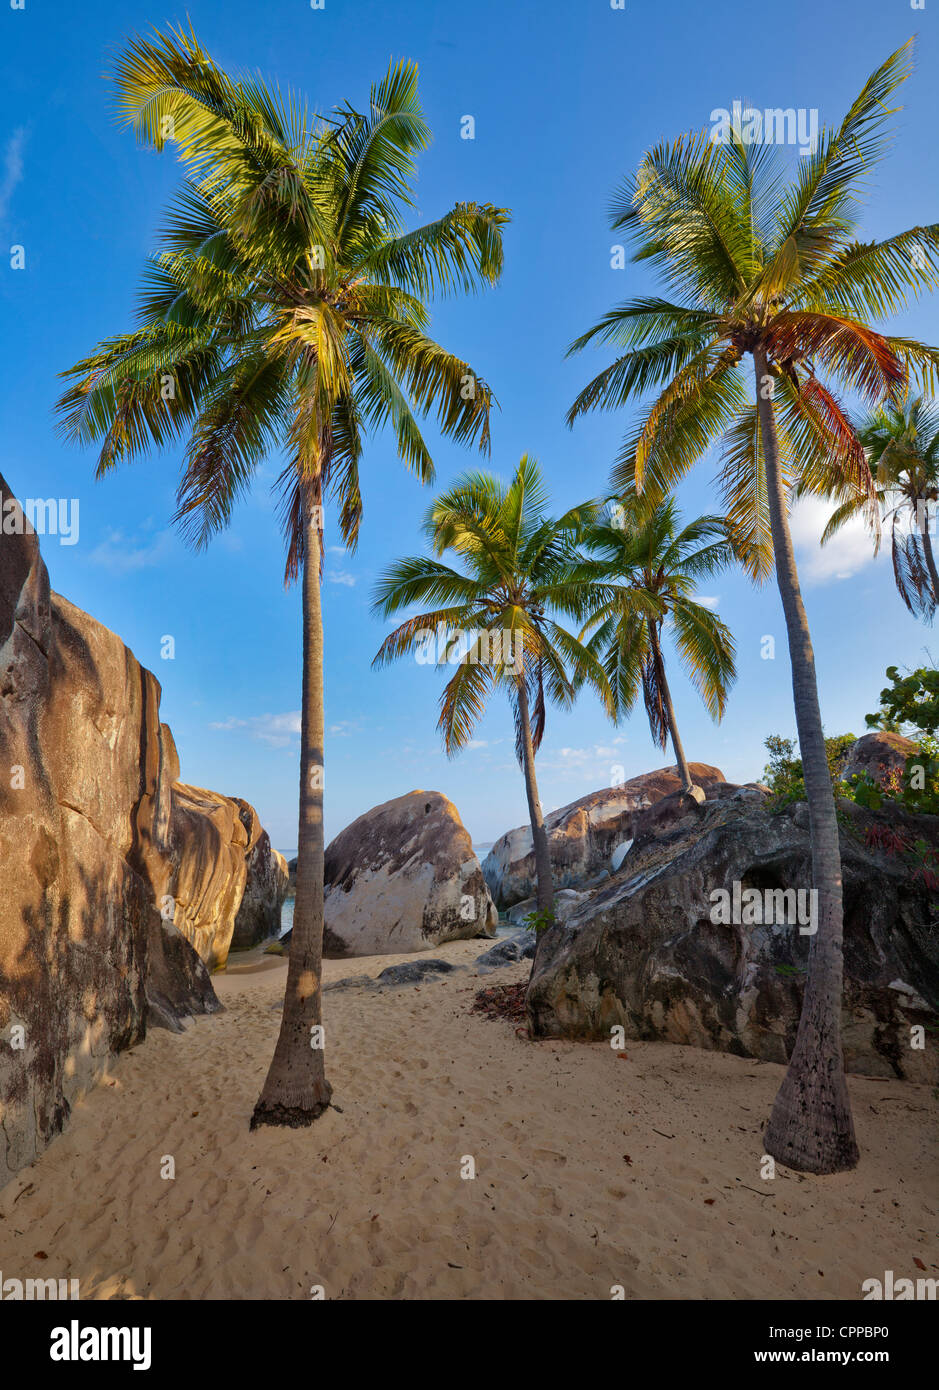 Virgin Gorda, British Virgin Islands, Caribbean Plam trees on the beach among the granite boulders at The Crawl - Stock Image